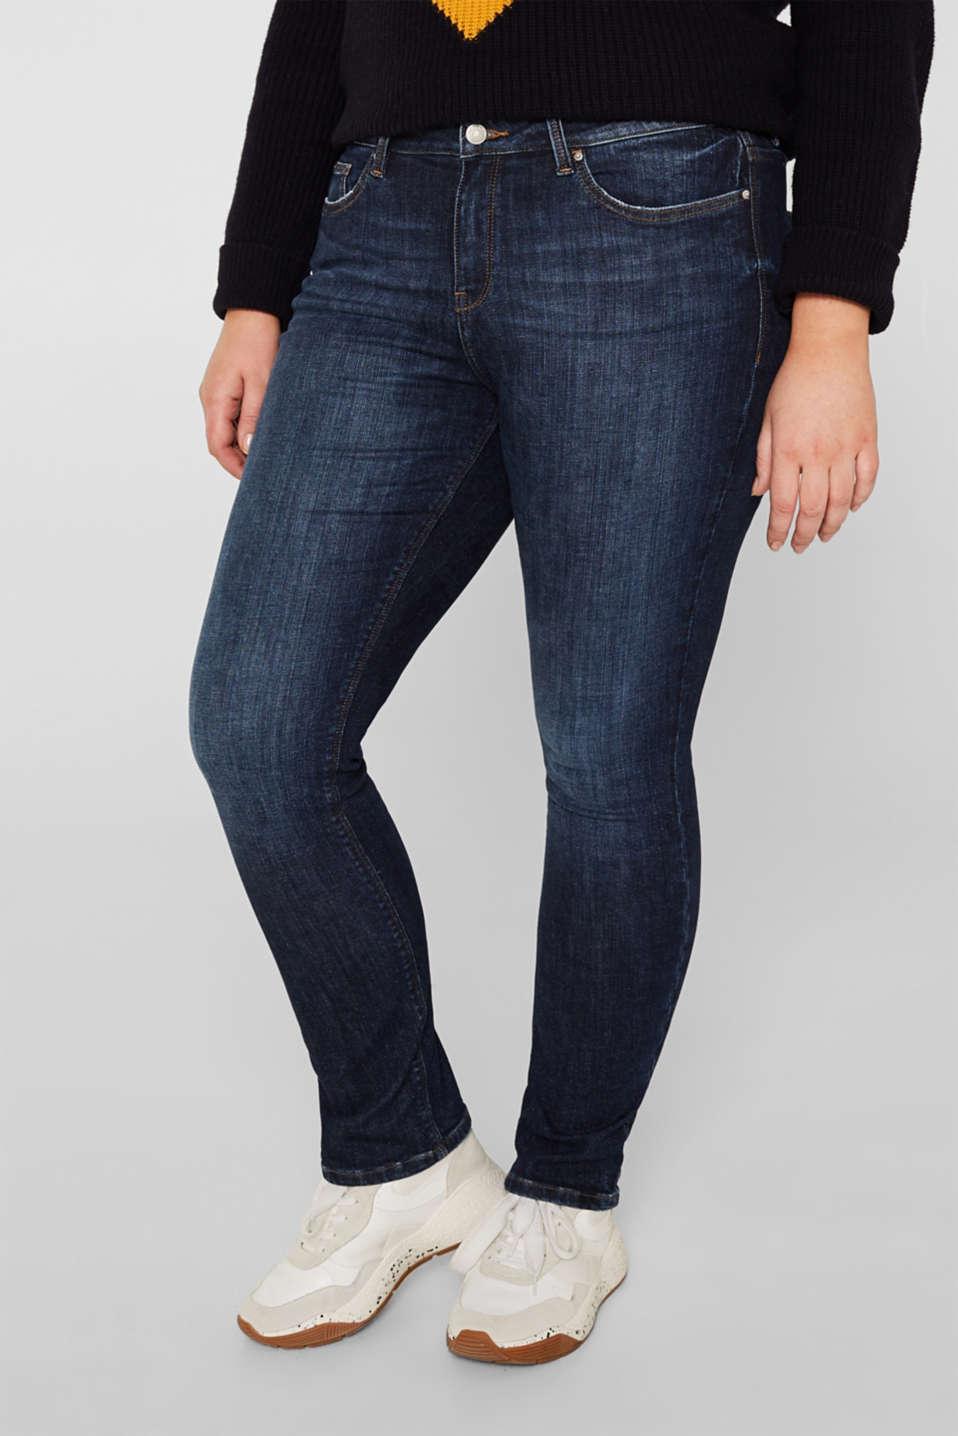 CURVY basic stretch jeans, BLUE DARK WASH, detail image number 6